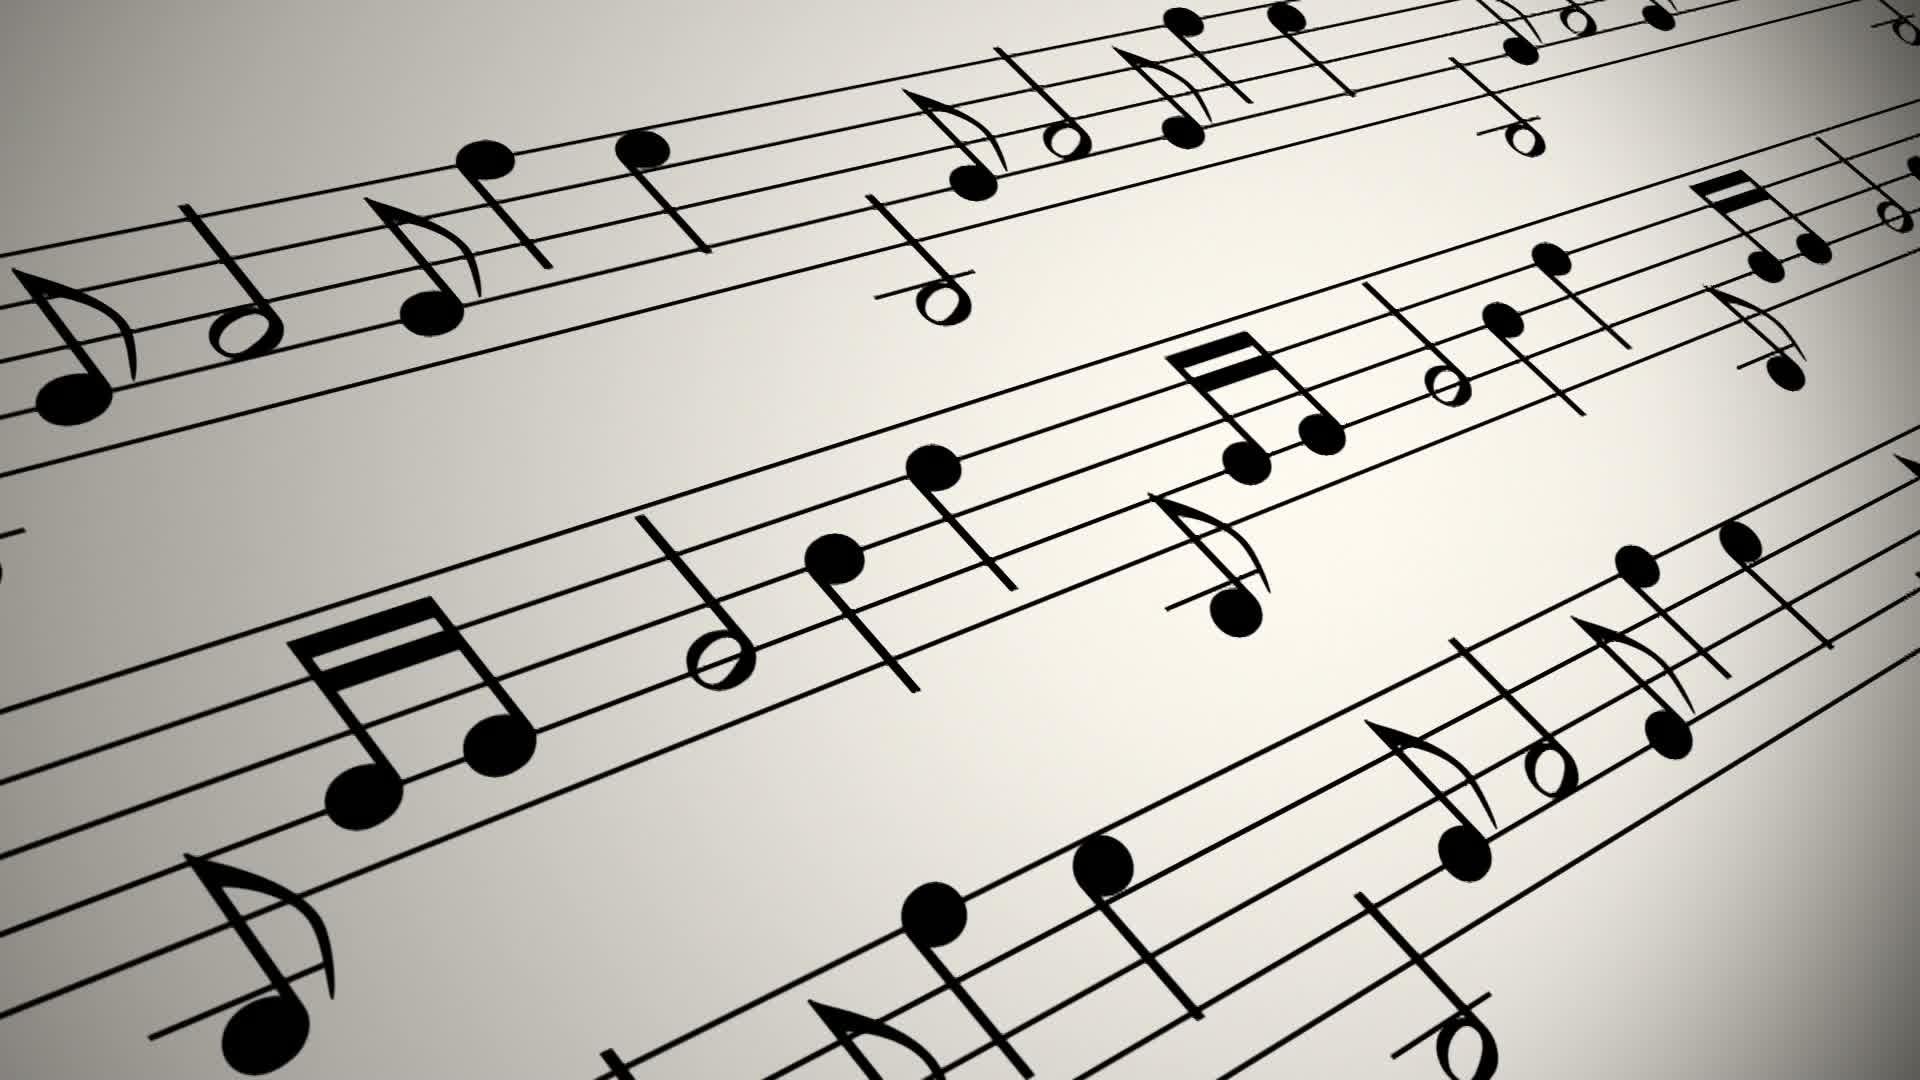 204610-cool-sheet-music-background-1920x1080.jpg